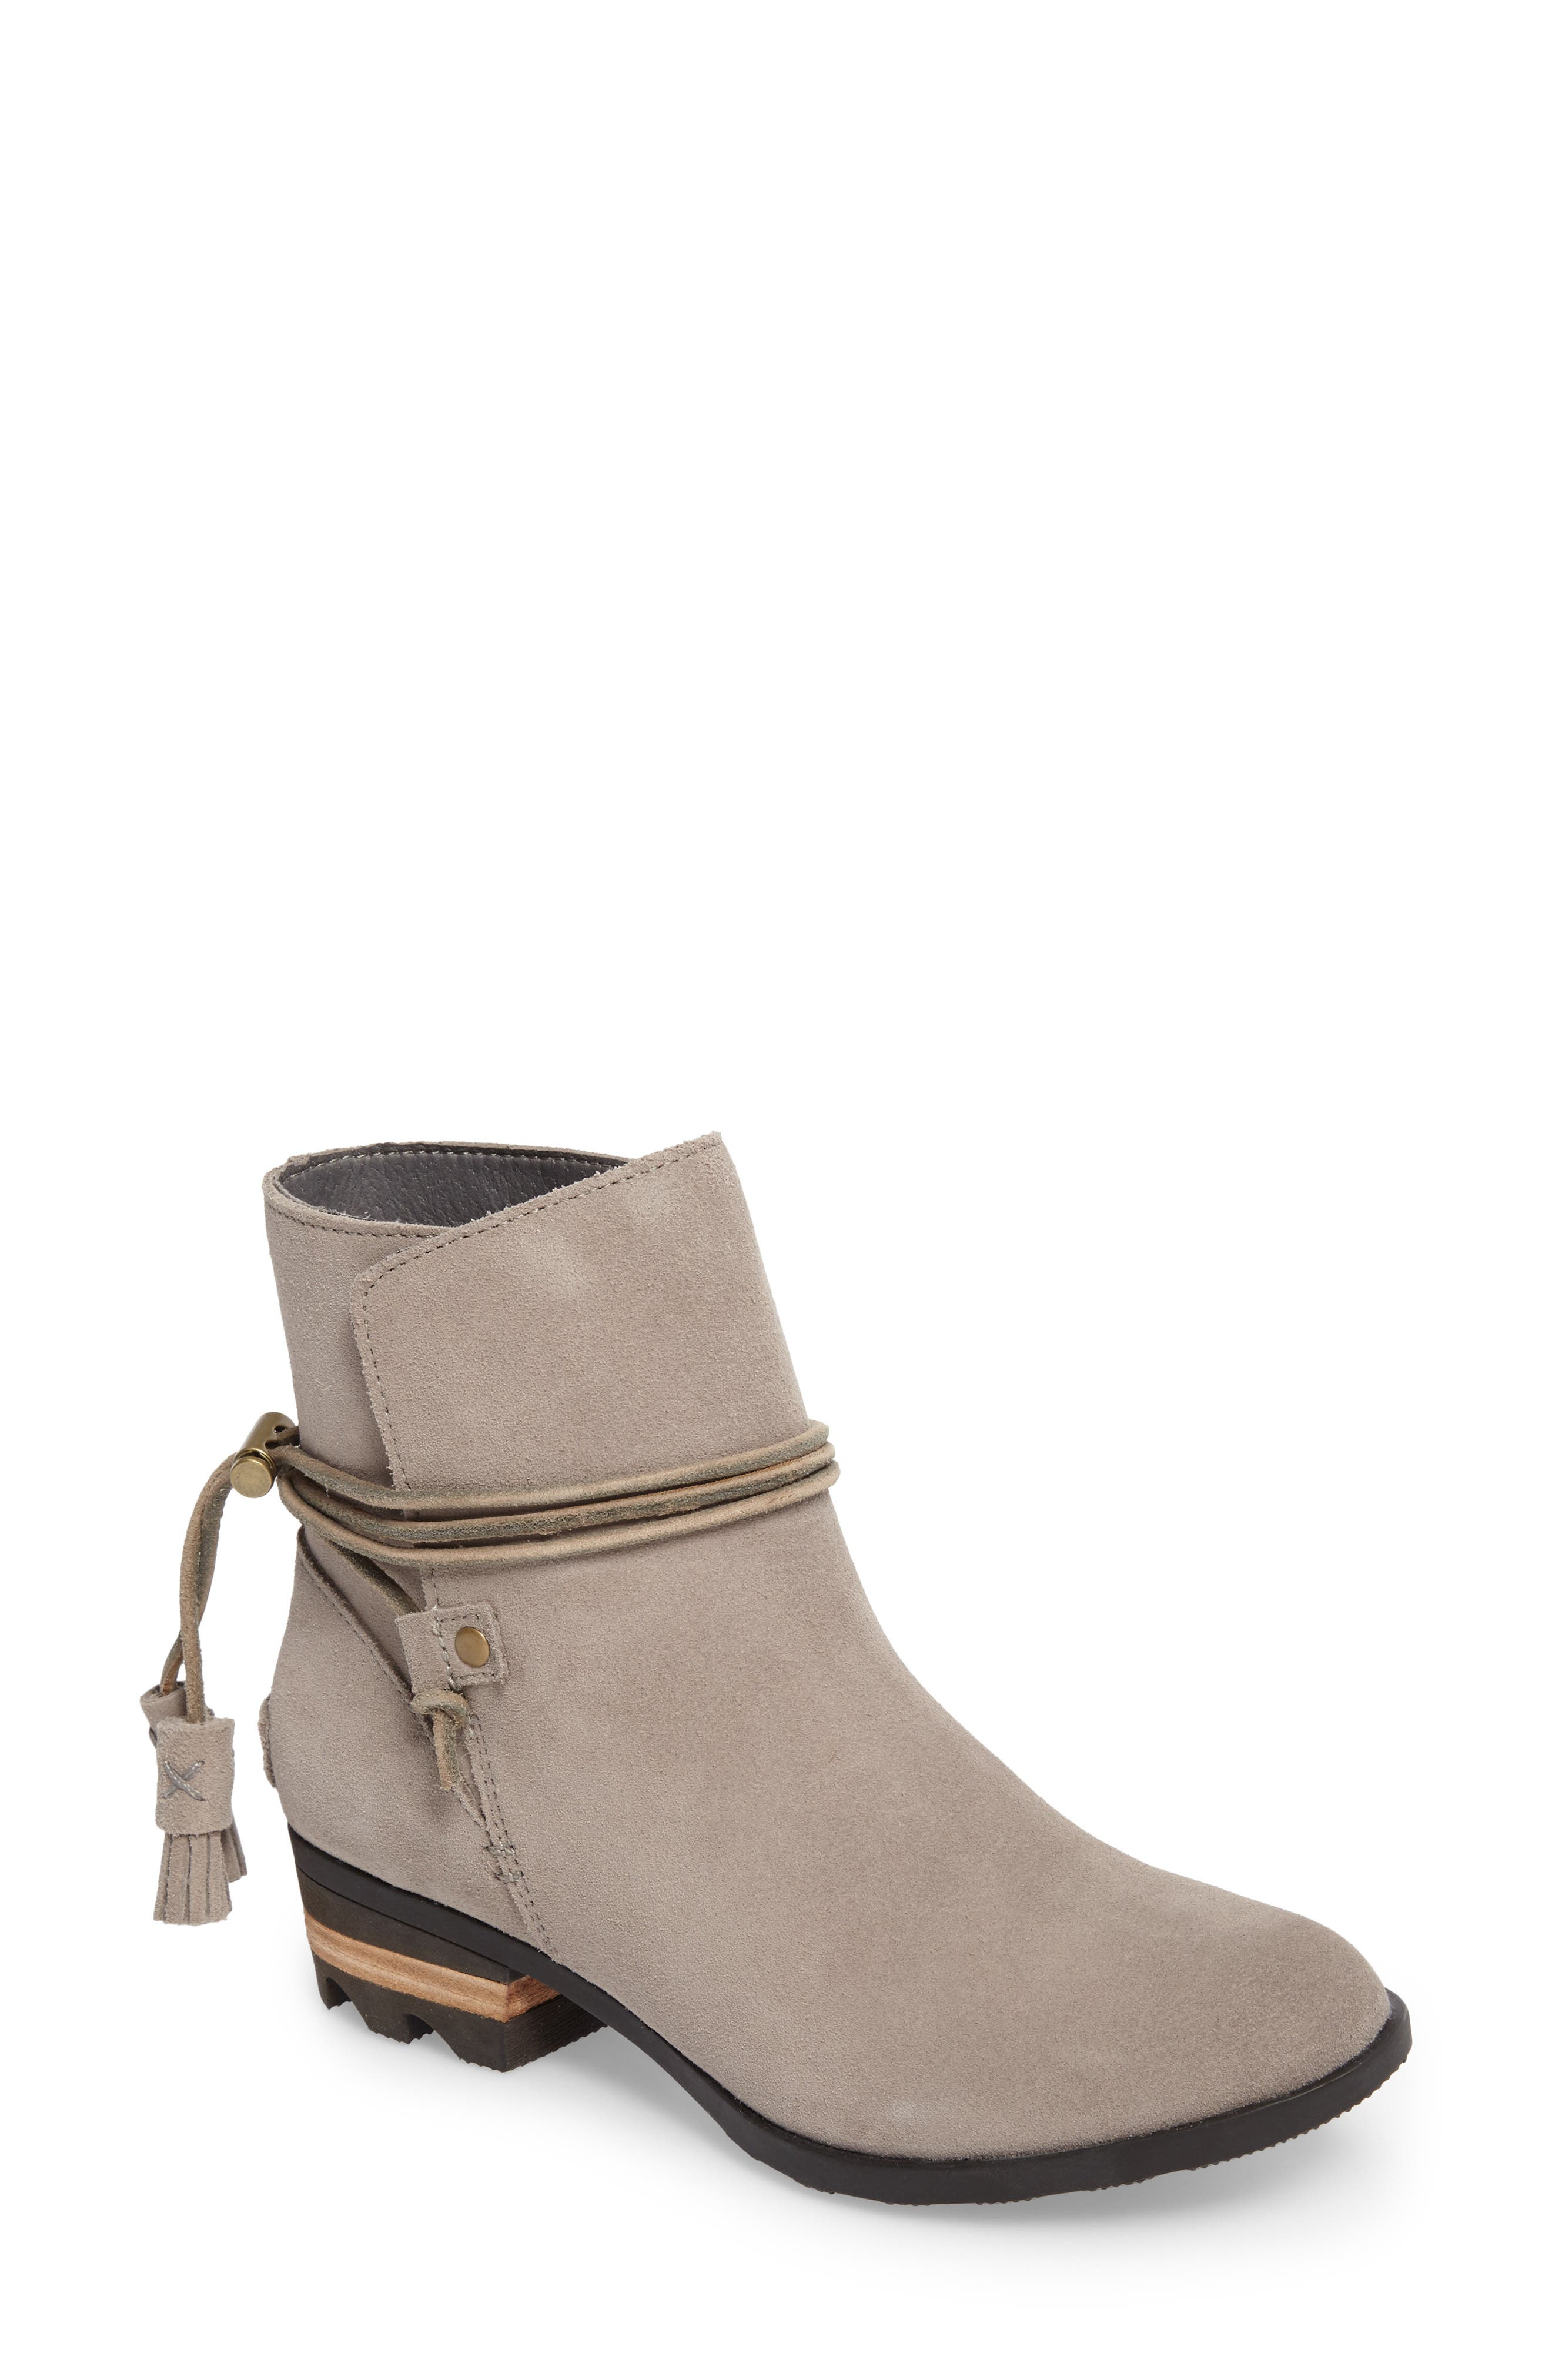 Farah Waterproof Boot,                         Main,                         color, Kettle/ Jet